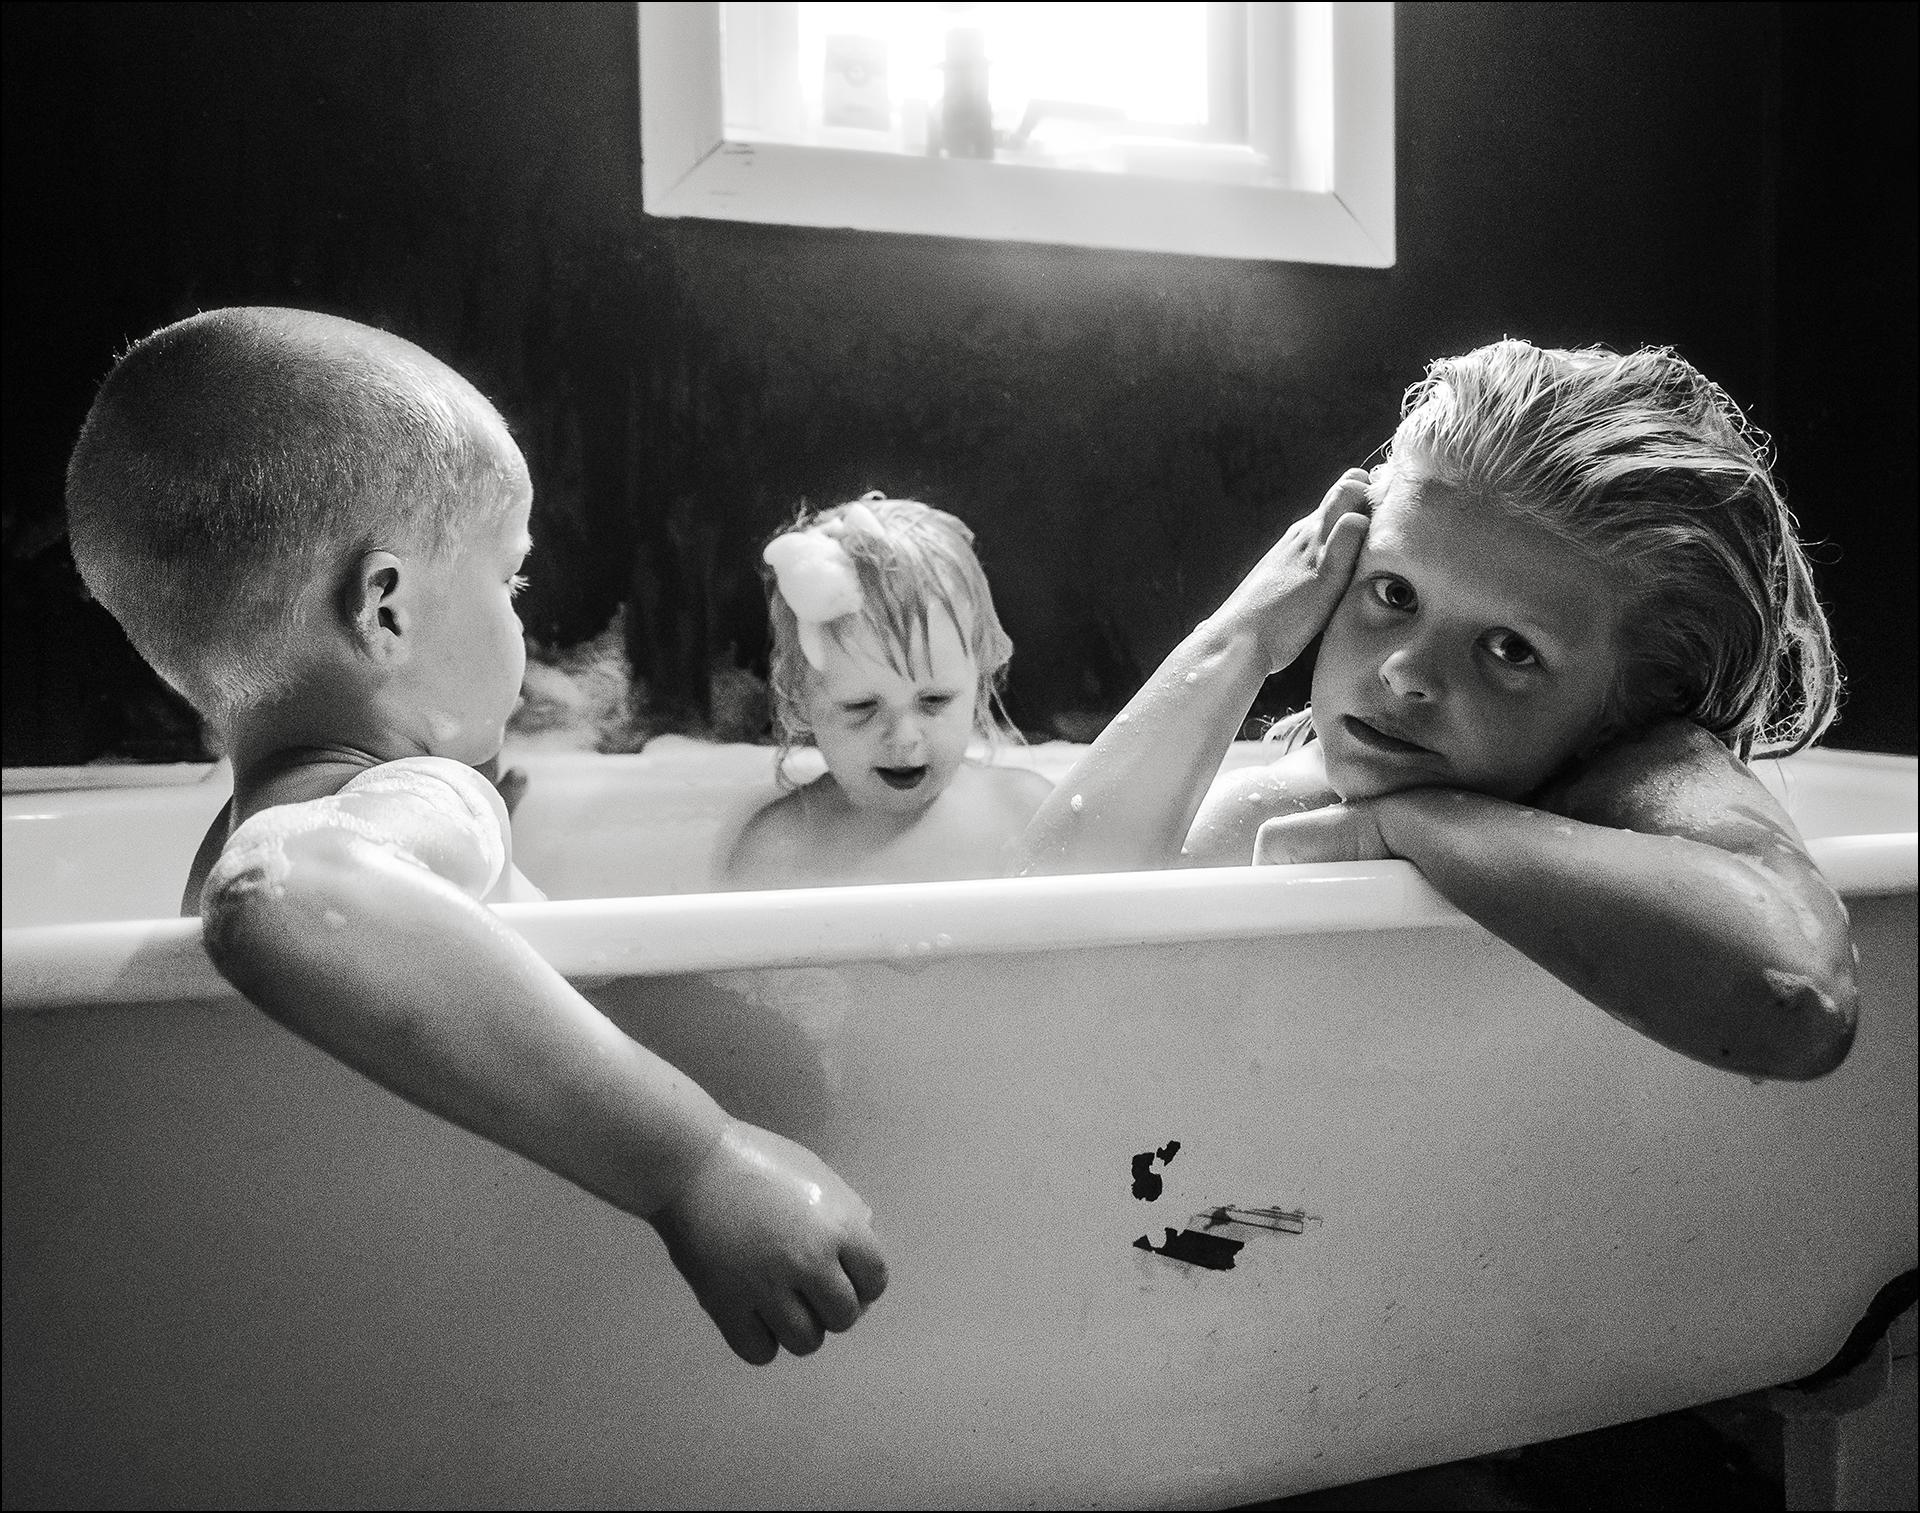 P6270274 alle kidsa badekar hummer 14